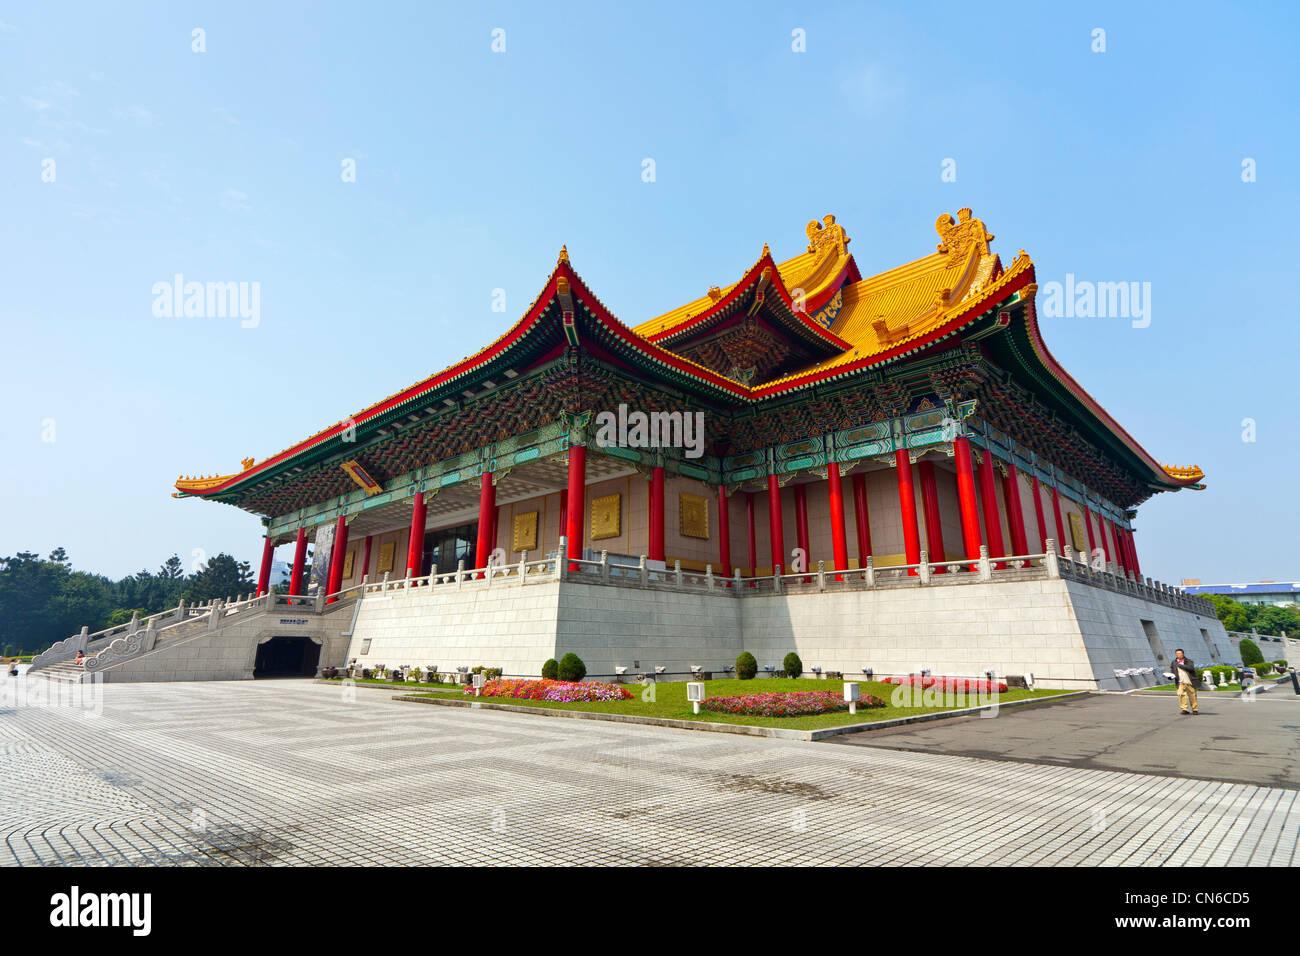 En el National Concert Hall, la Plaza de la Libertad (Freedom Square aka), Taipei, Taiwán. JMH5668 Imagen De Stock